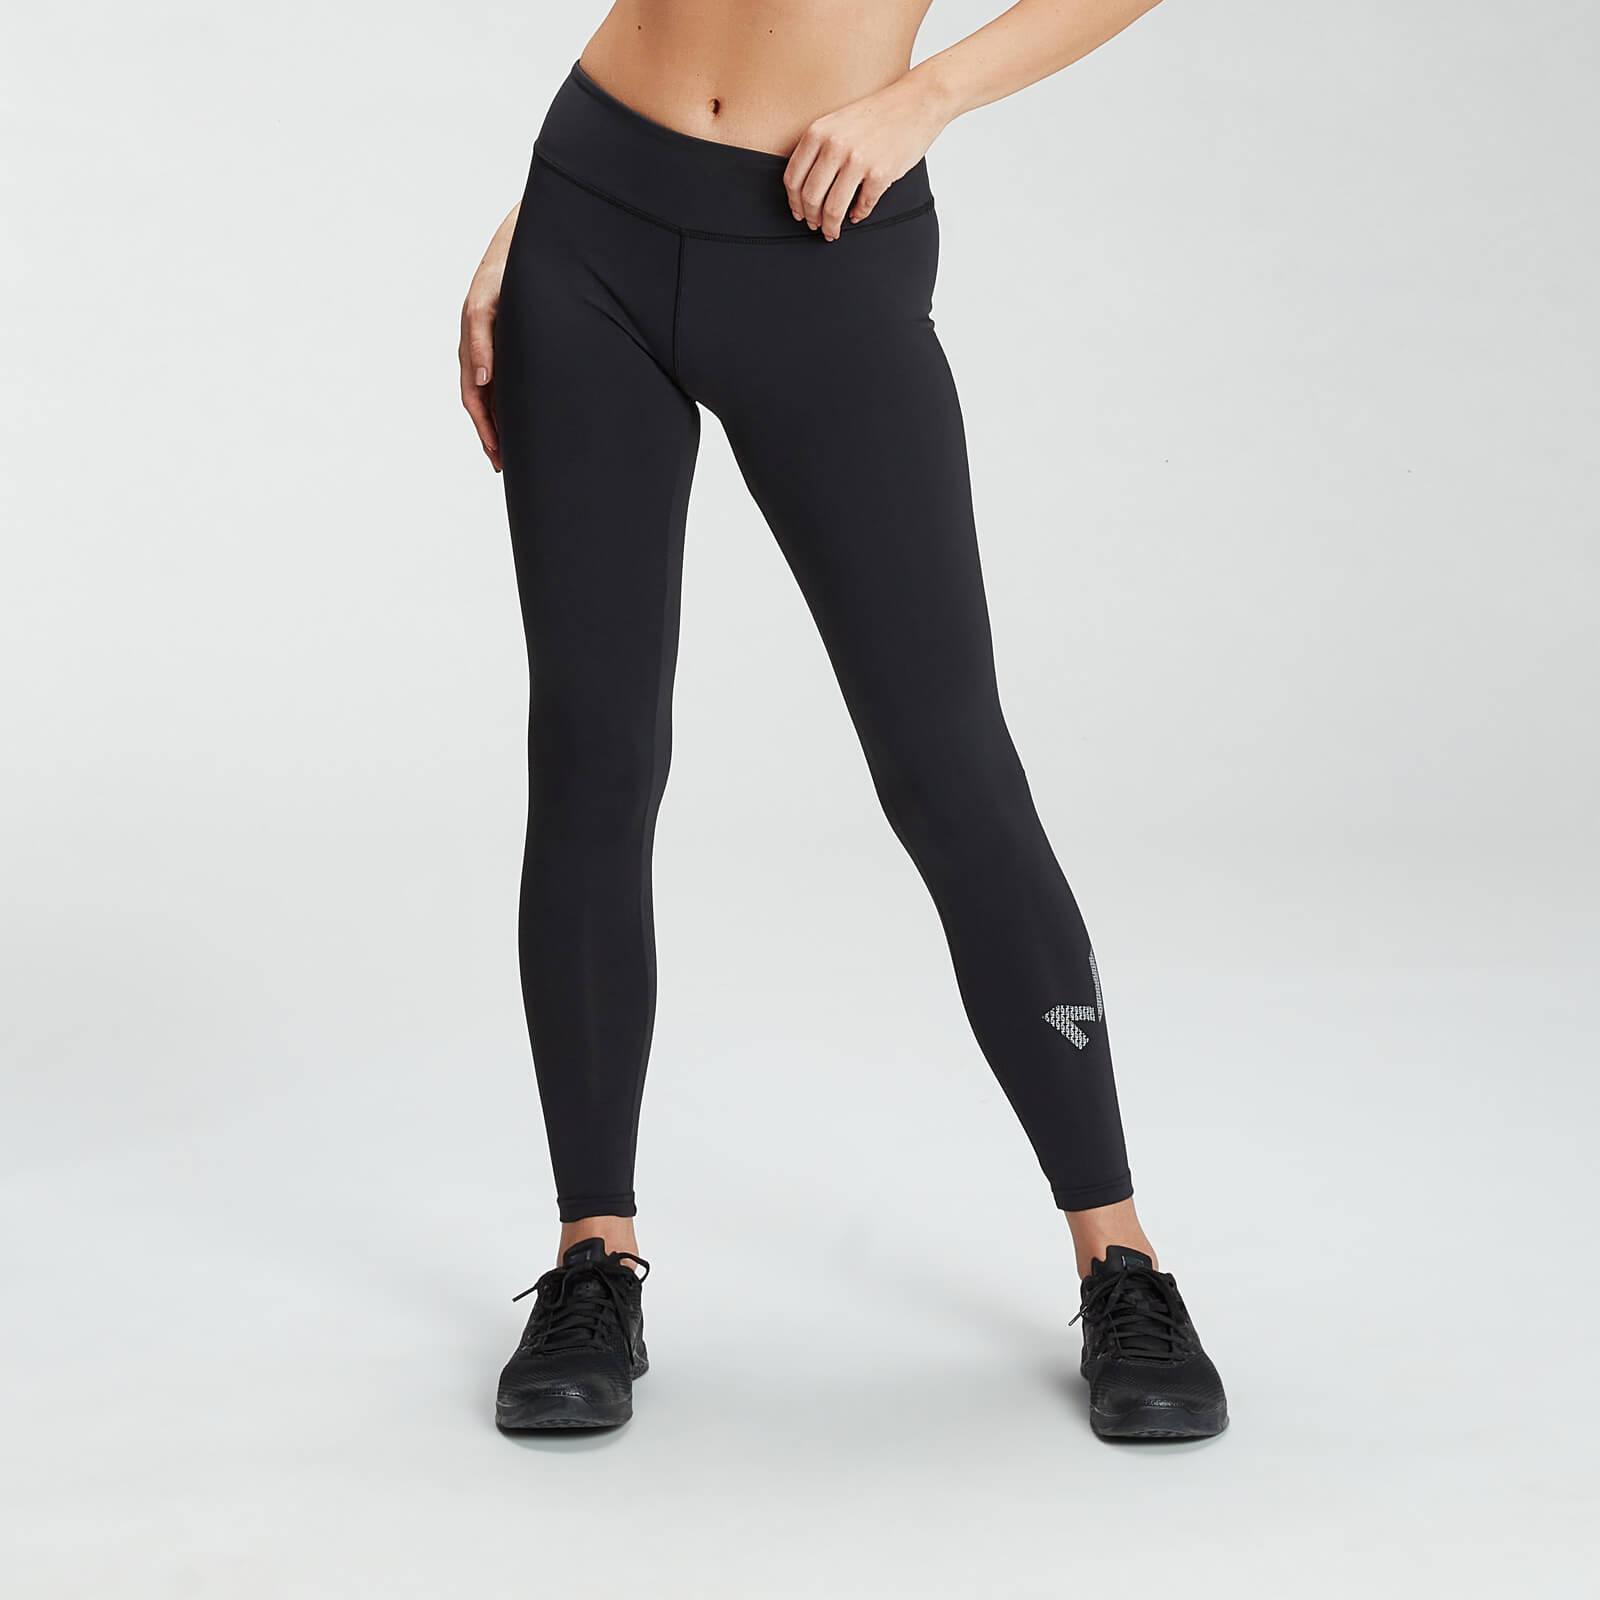 Купить MP Women's Essentials Printed Training Leggings - Black - XXS, Myprotein International